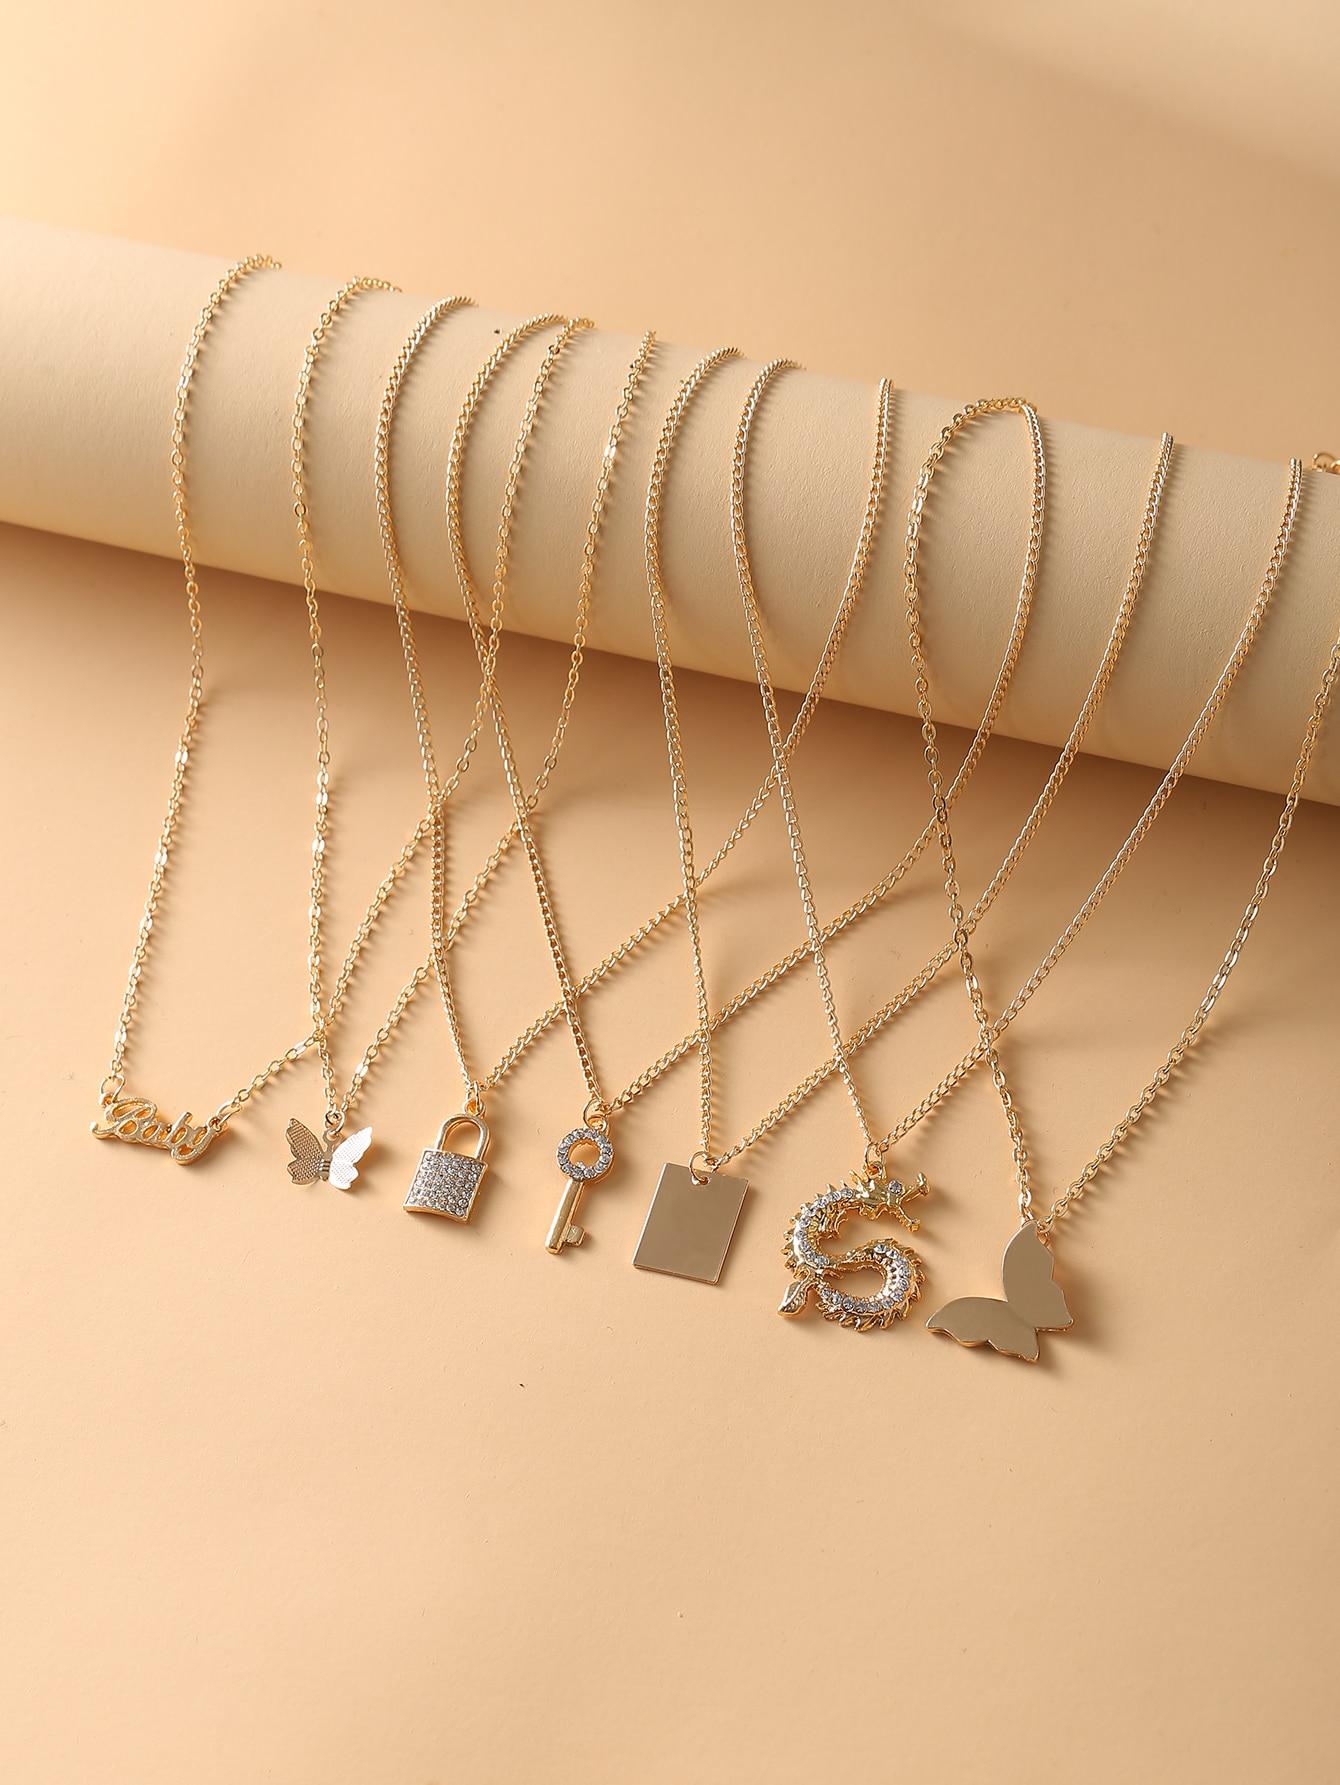 7pcs Dragon & Butterfly Charm Necklace thumbnail